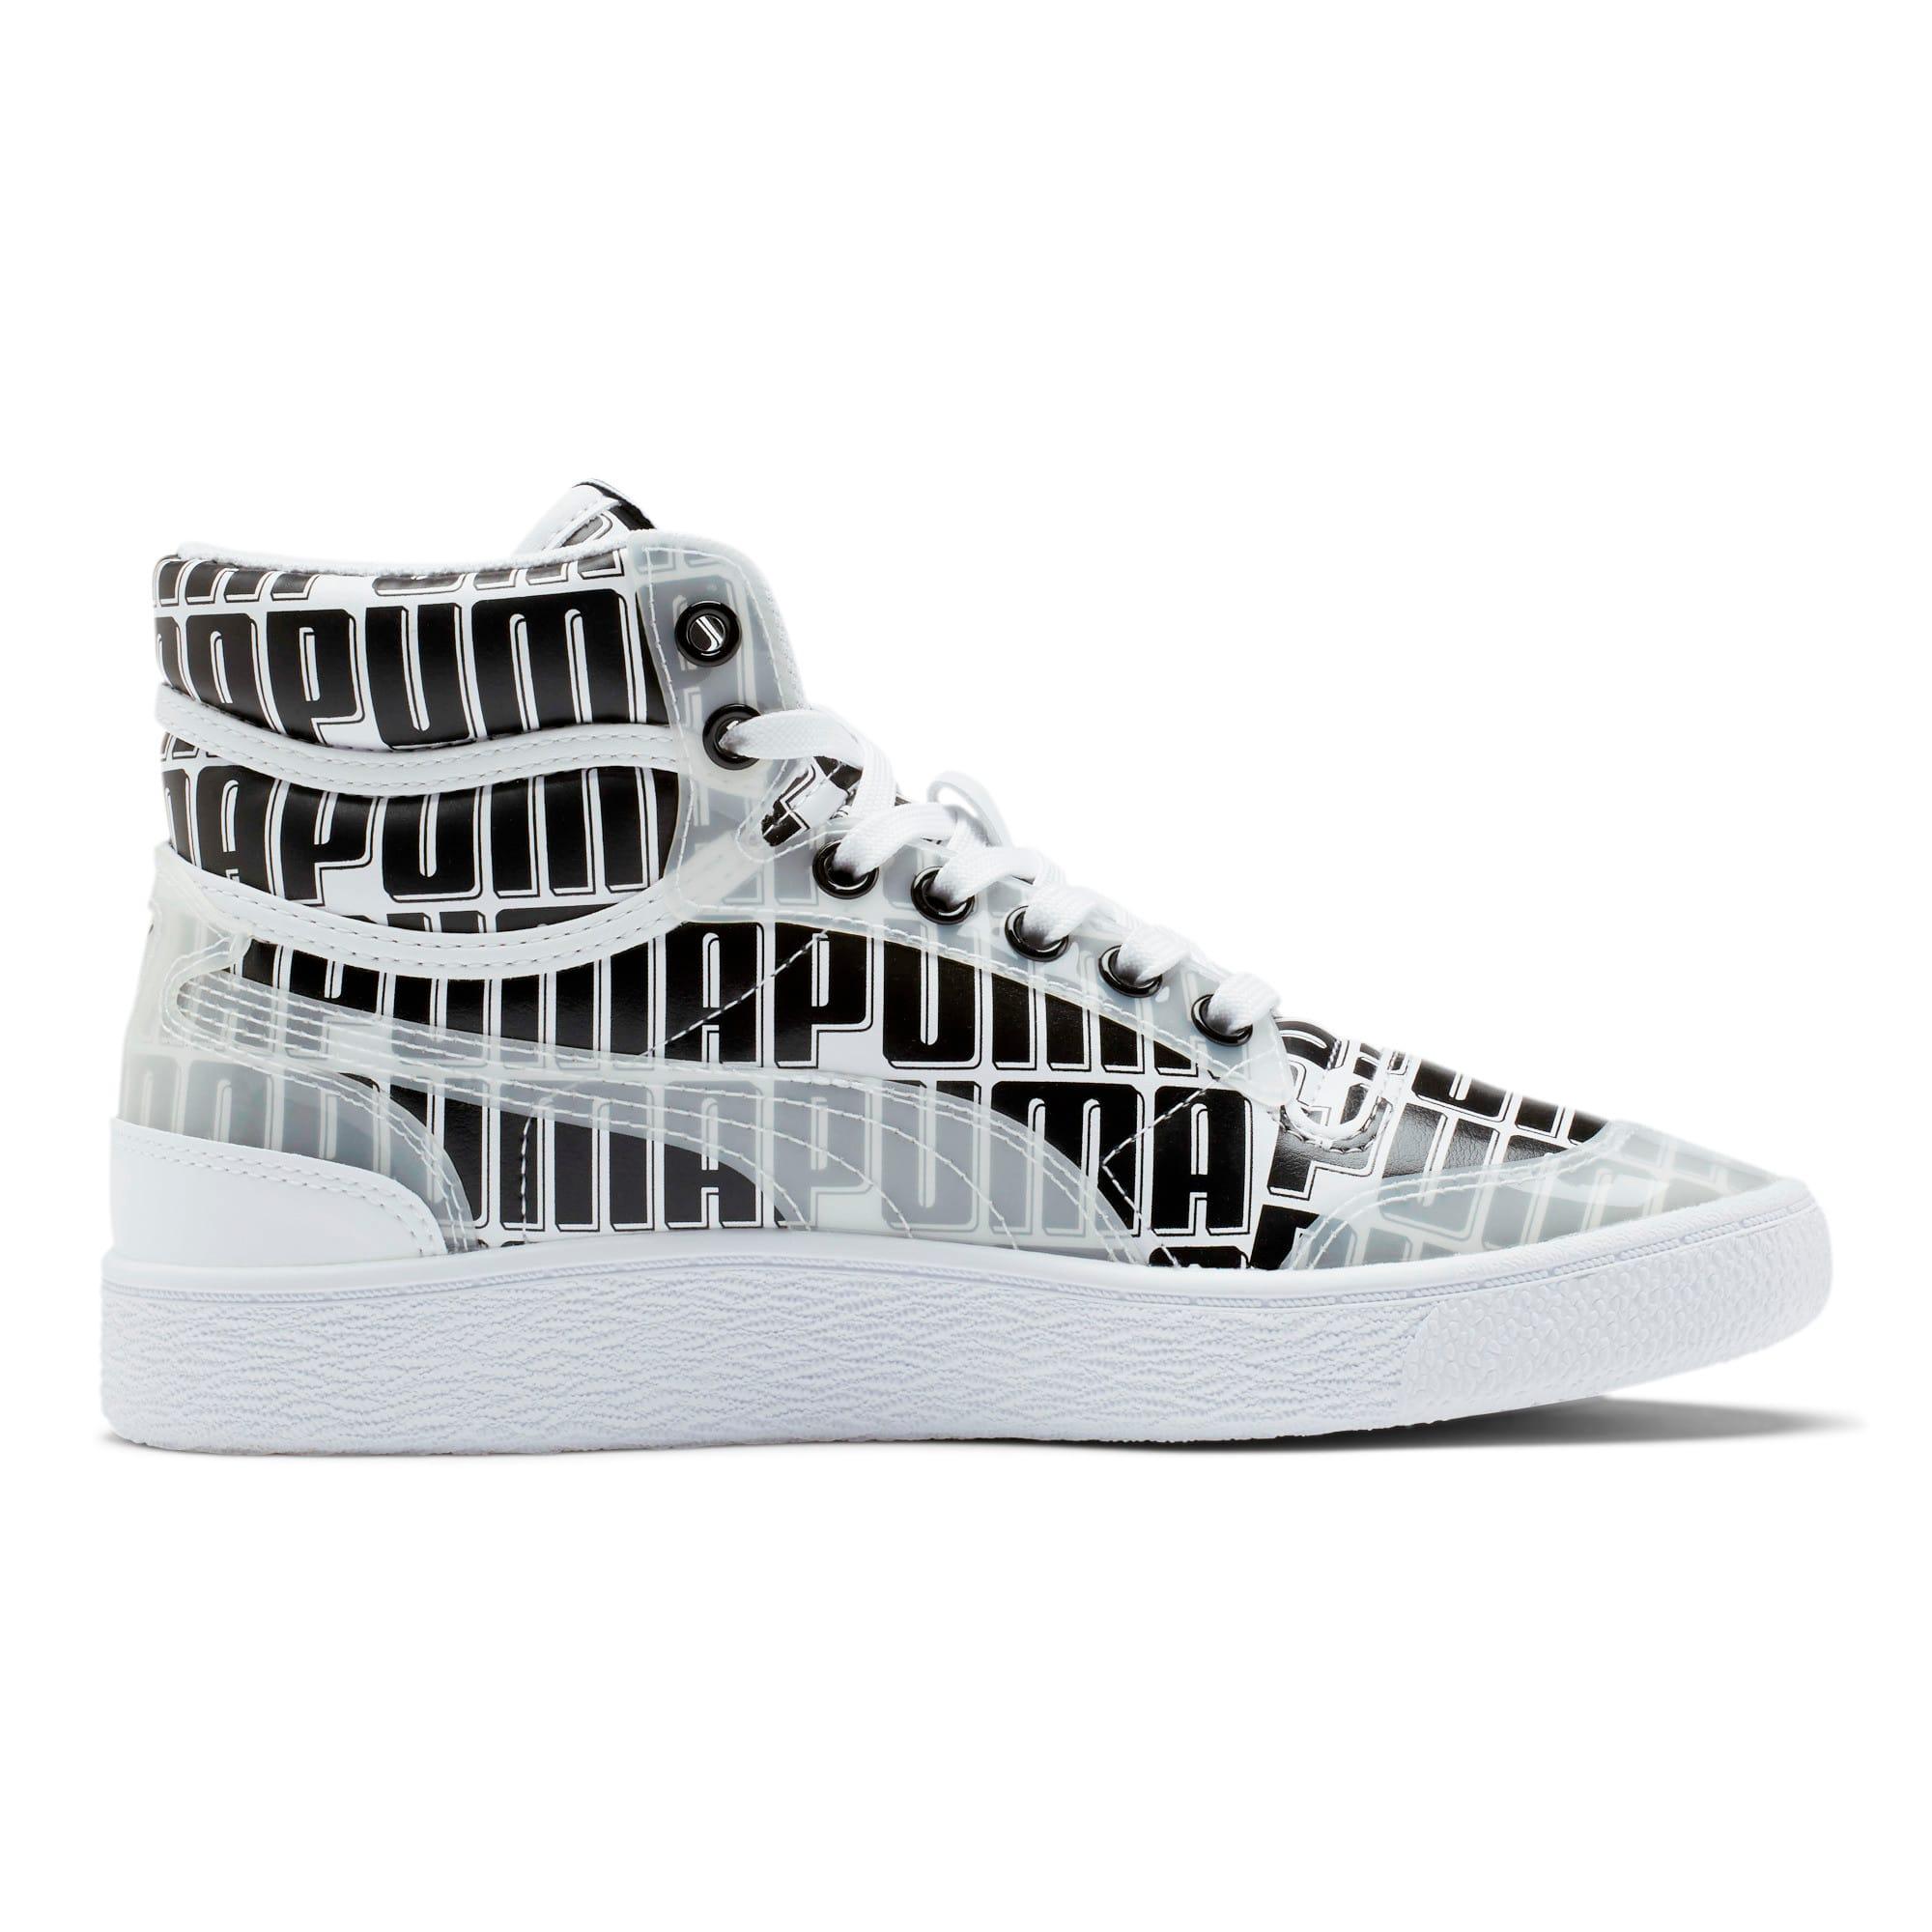 Thumbnail 5 of Ralph Sampson Mid Logo Women's Sneakers, Puma White-Puma Black, medium